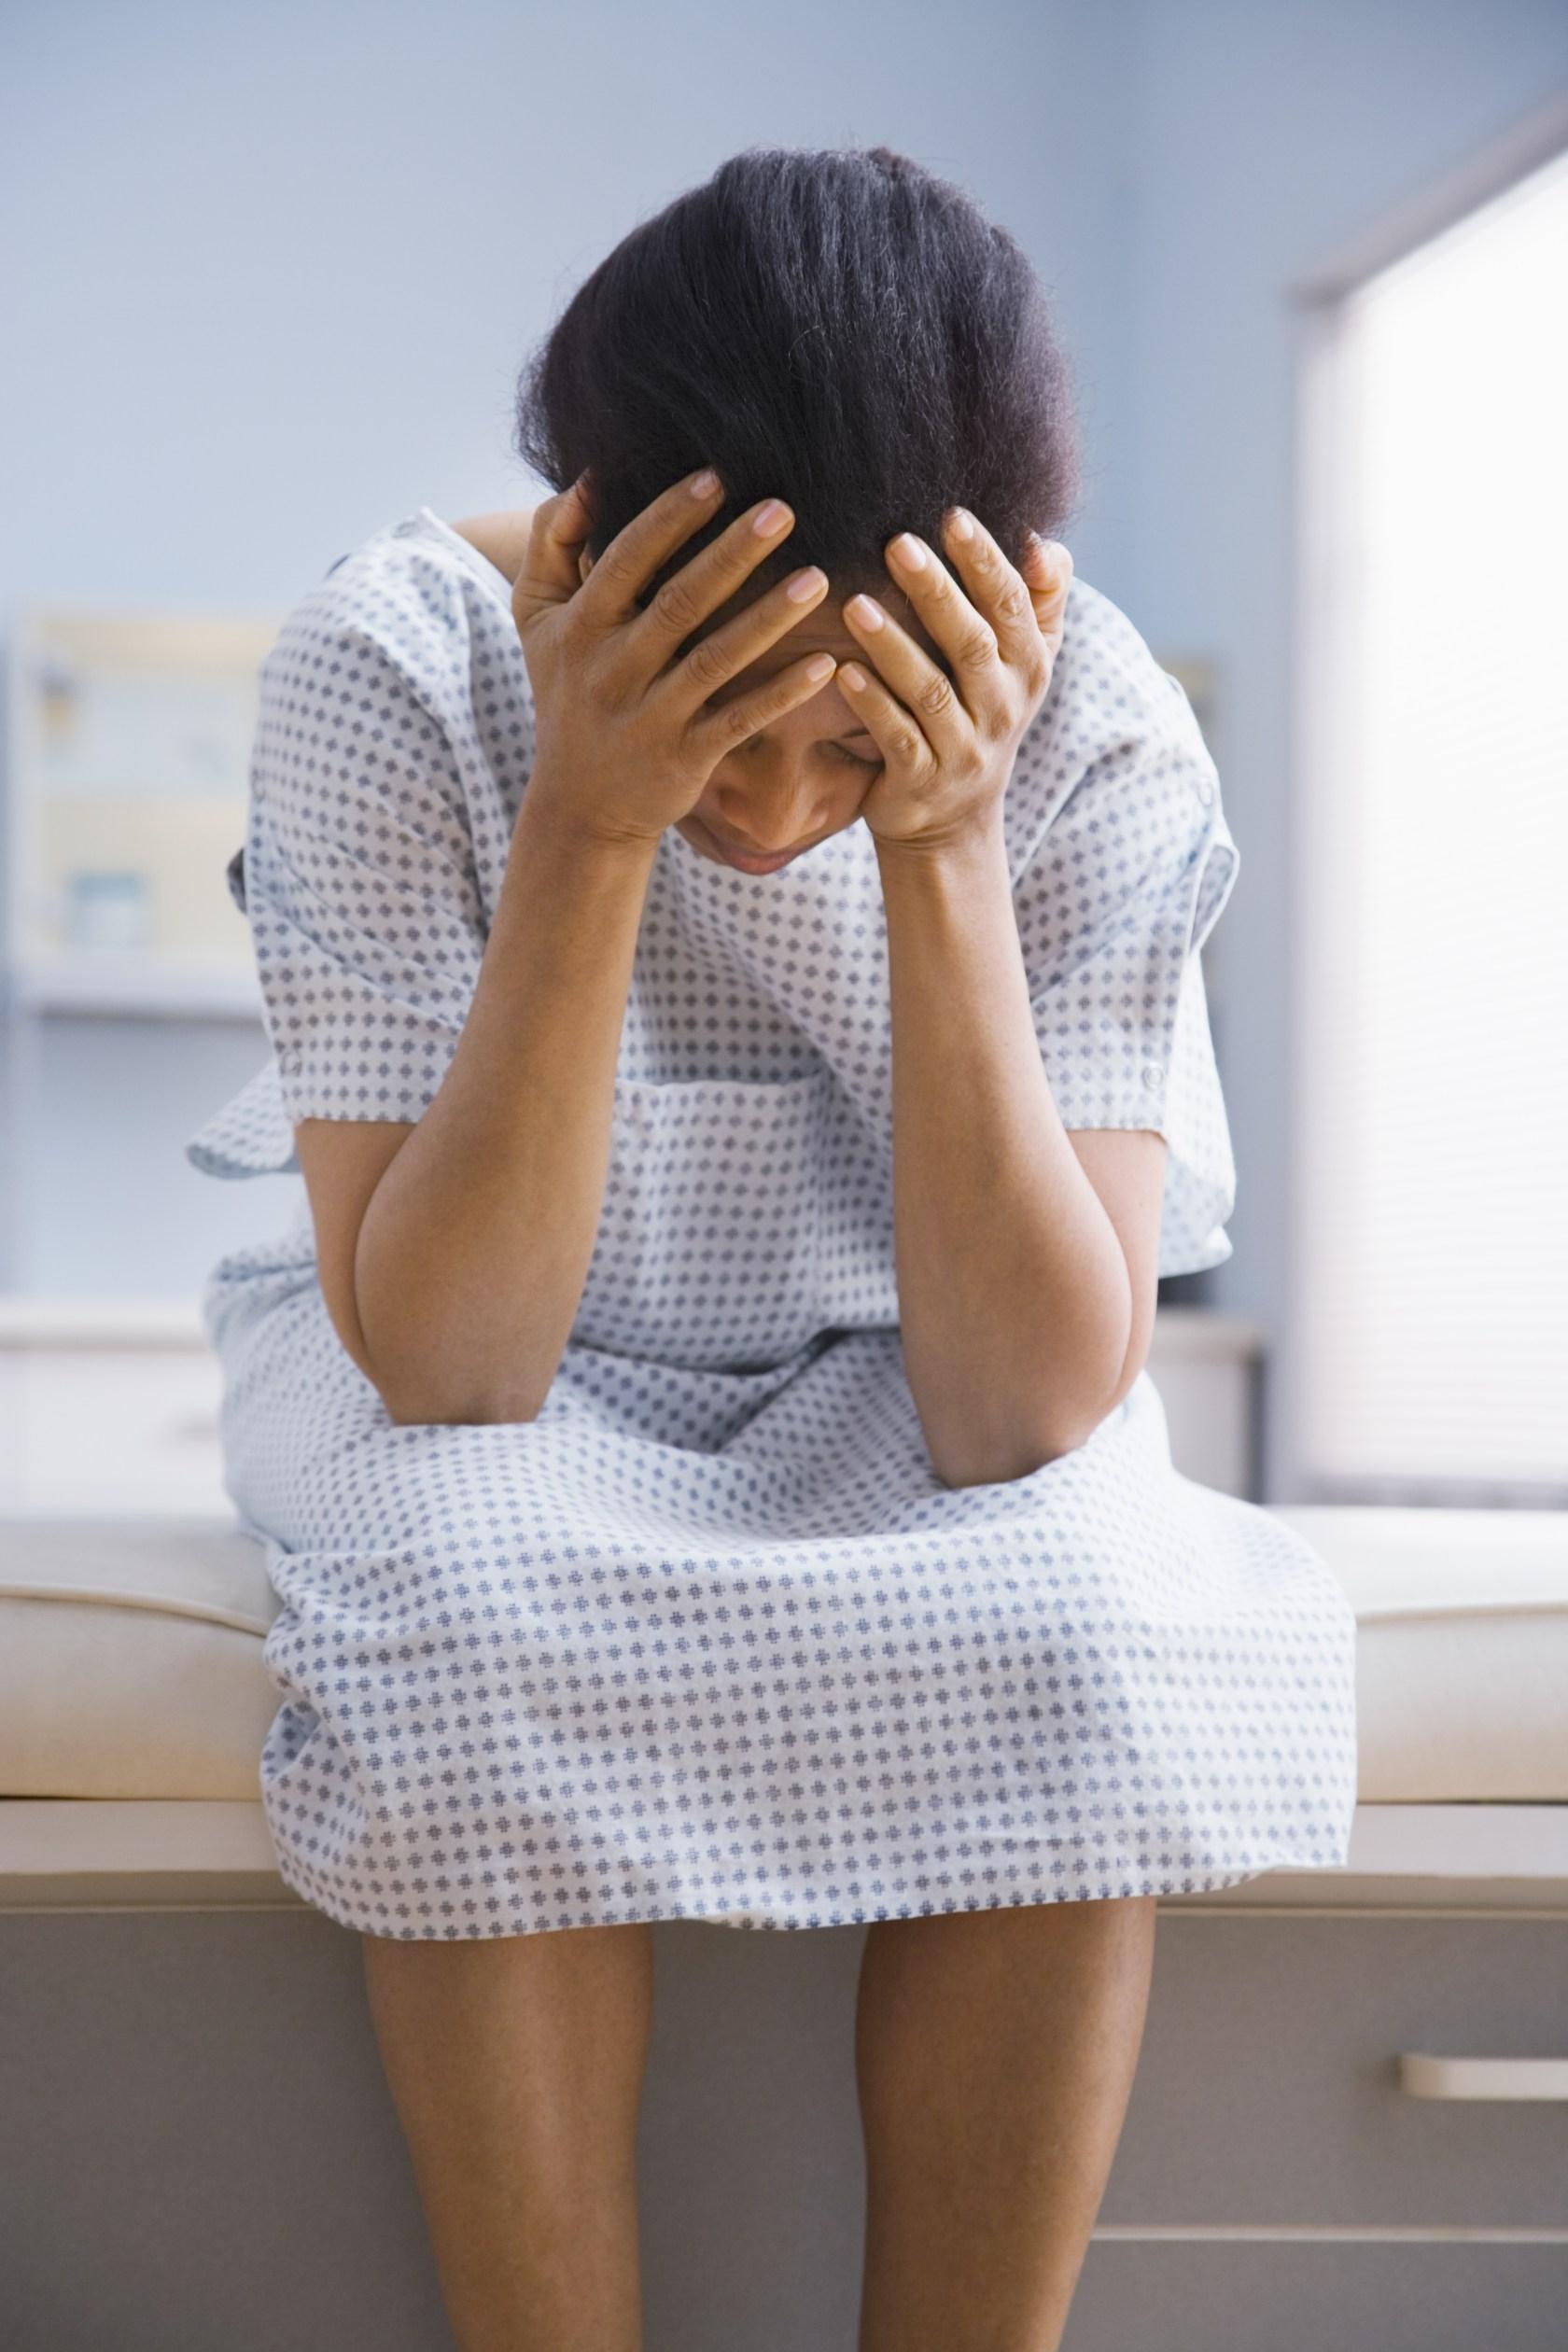 Black patient, concerned